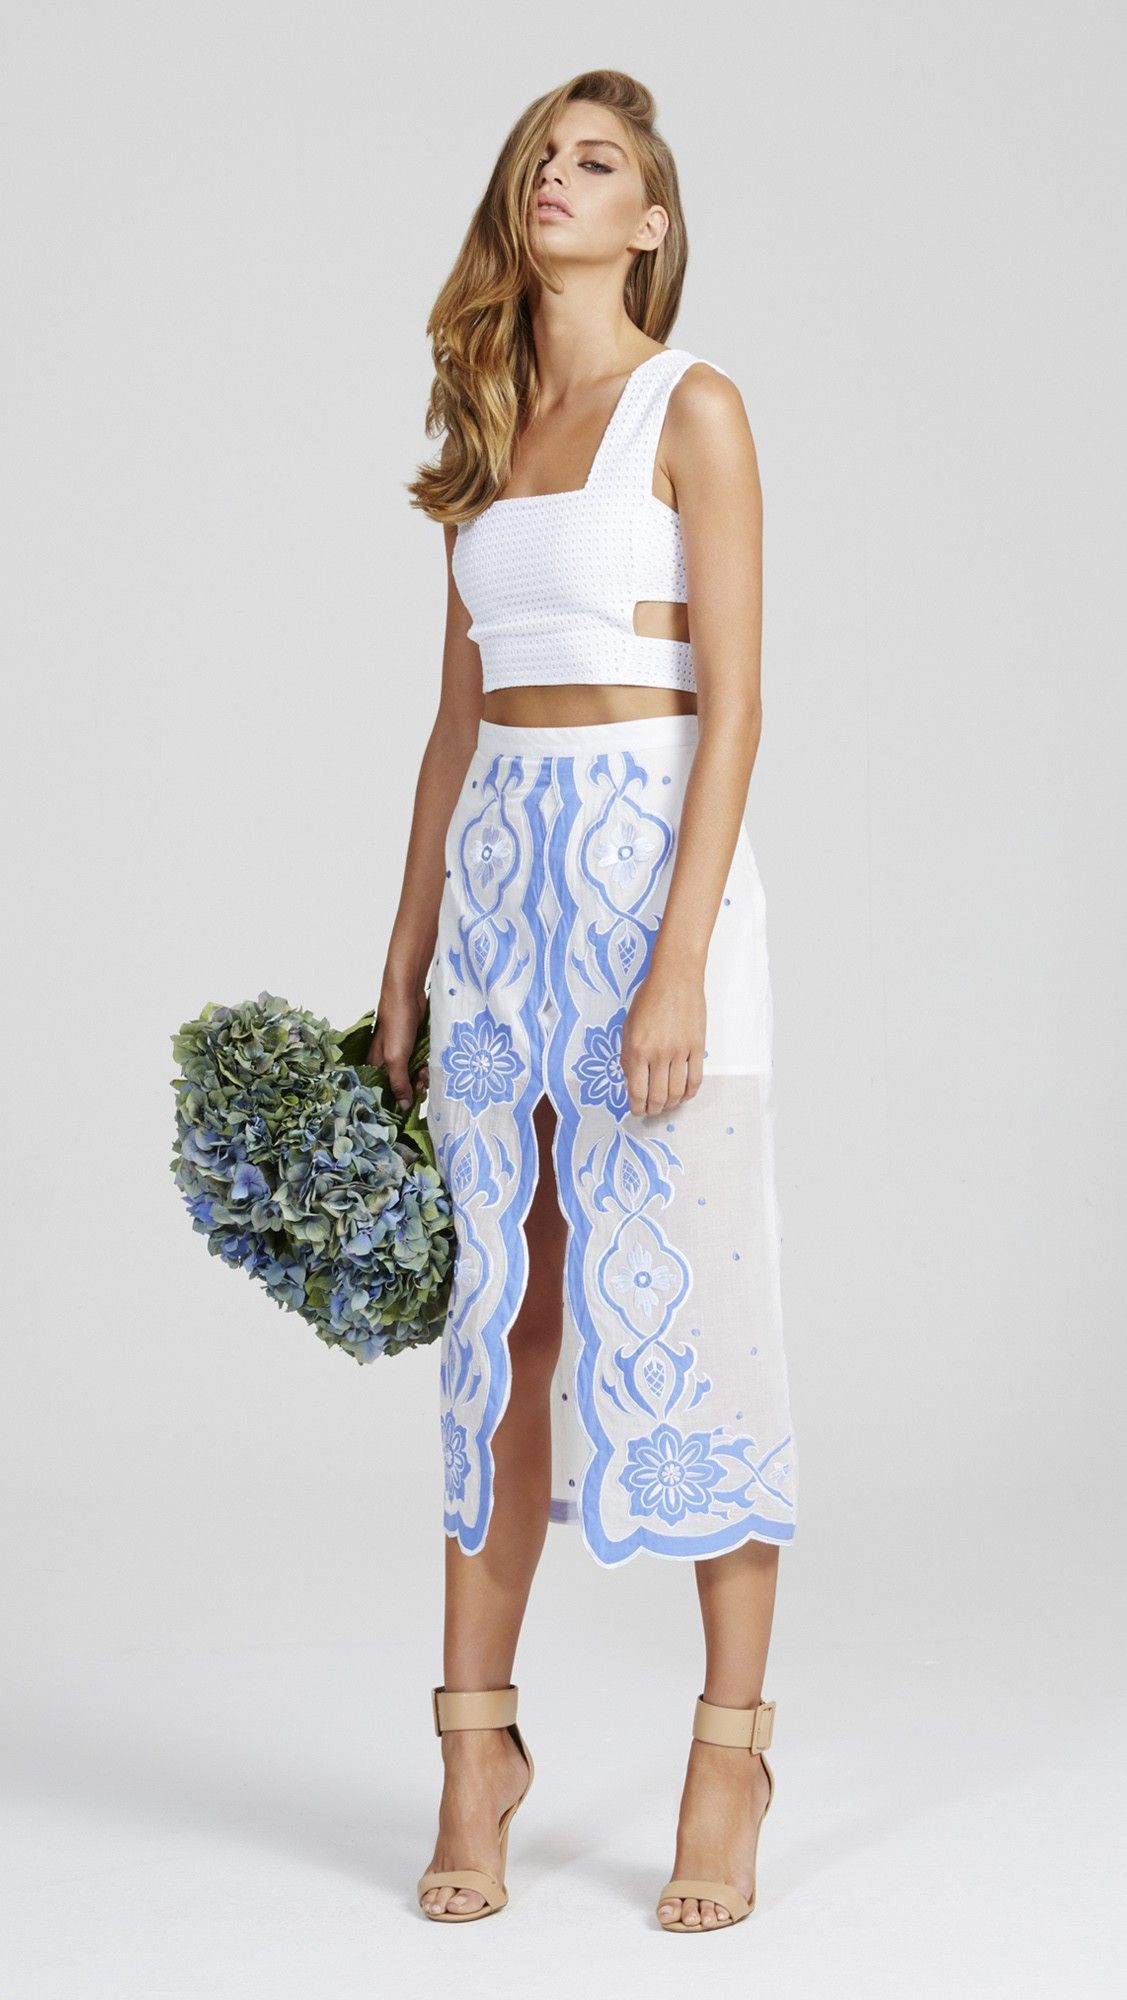 Alice mccall i will follow skirt on trend pinterest skirts